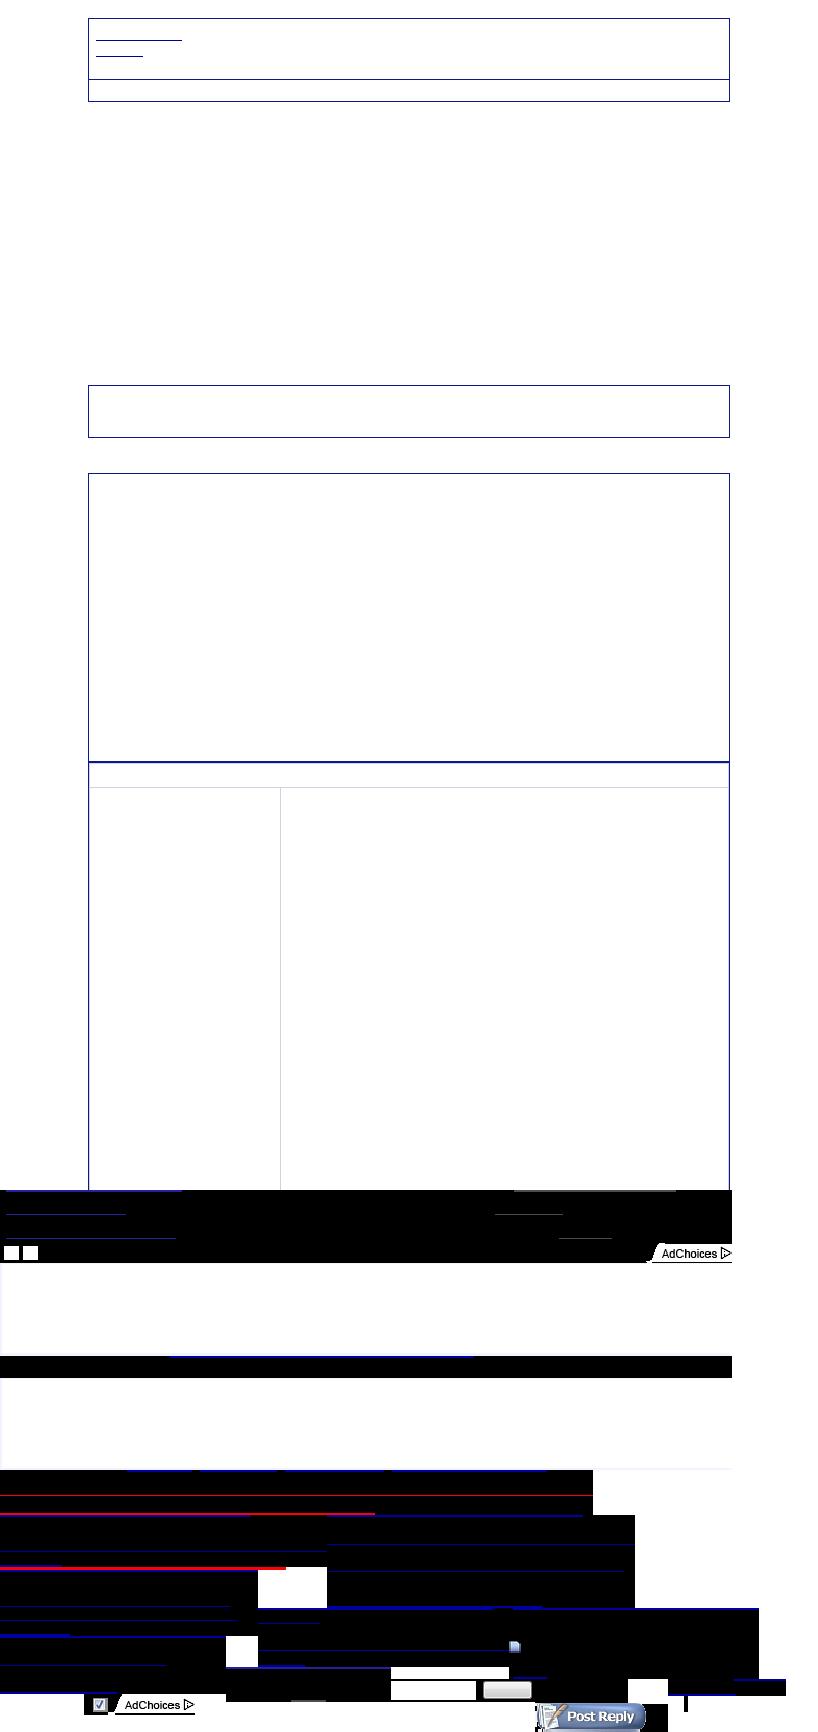 mba finance  u0026 marketing   resume cv biodata  curriculum vitae  sample format  cover letter